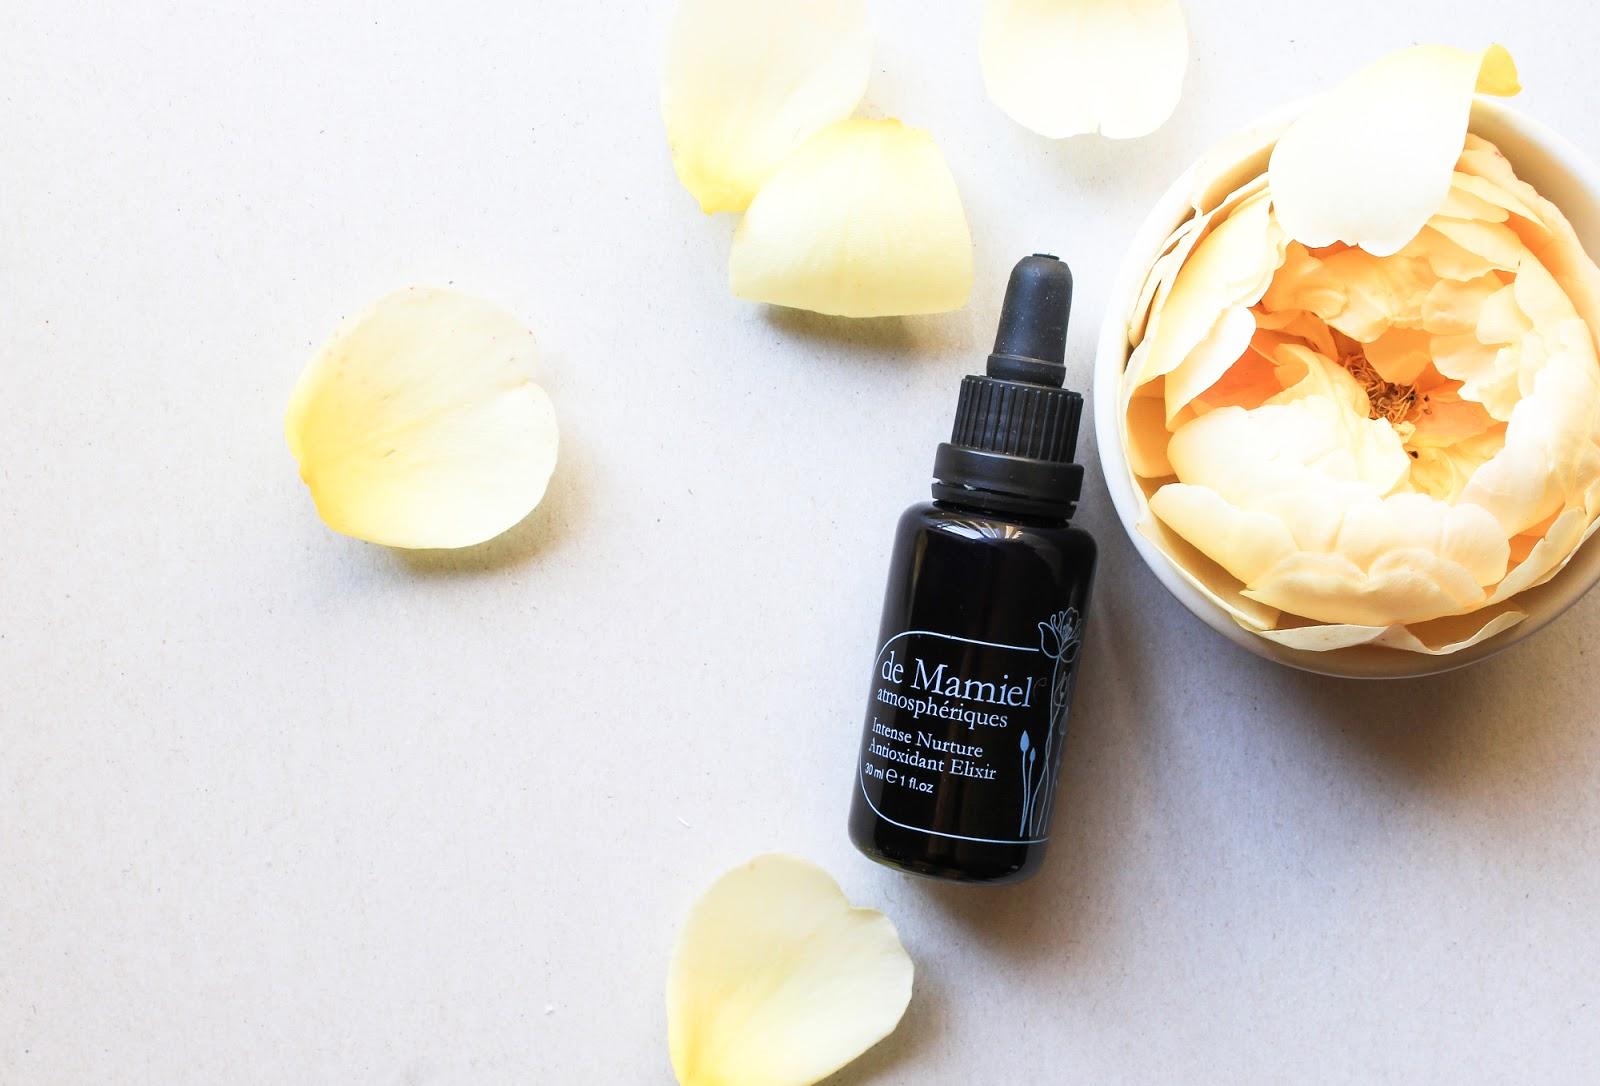 de Mamiel Intense Nurture Antioxidant Elixir Serum. Beauty Heroes.